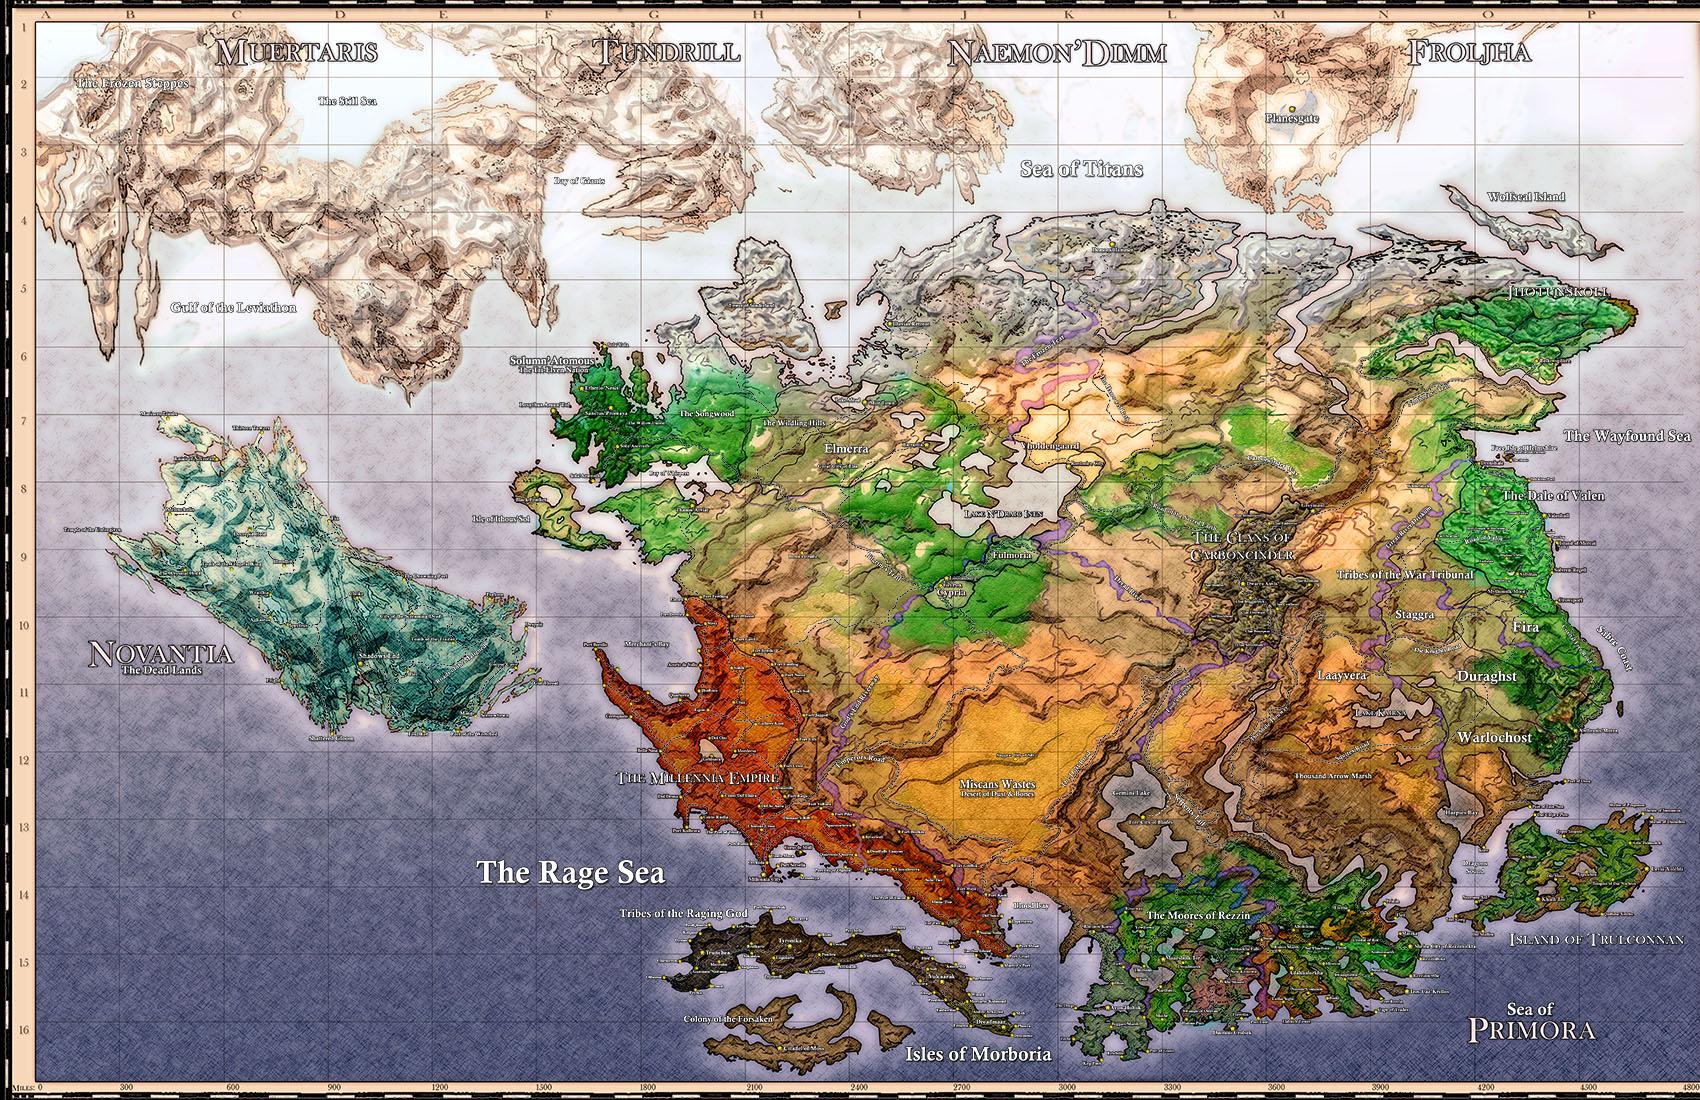 Primora_map.jpg